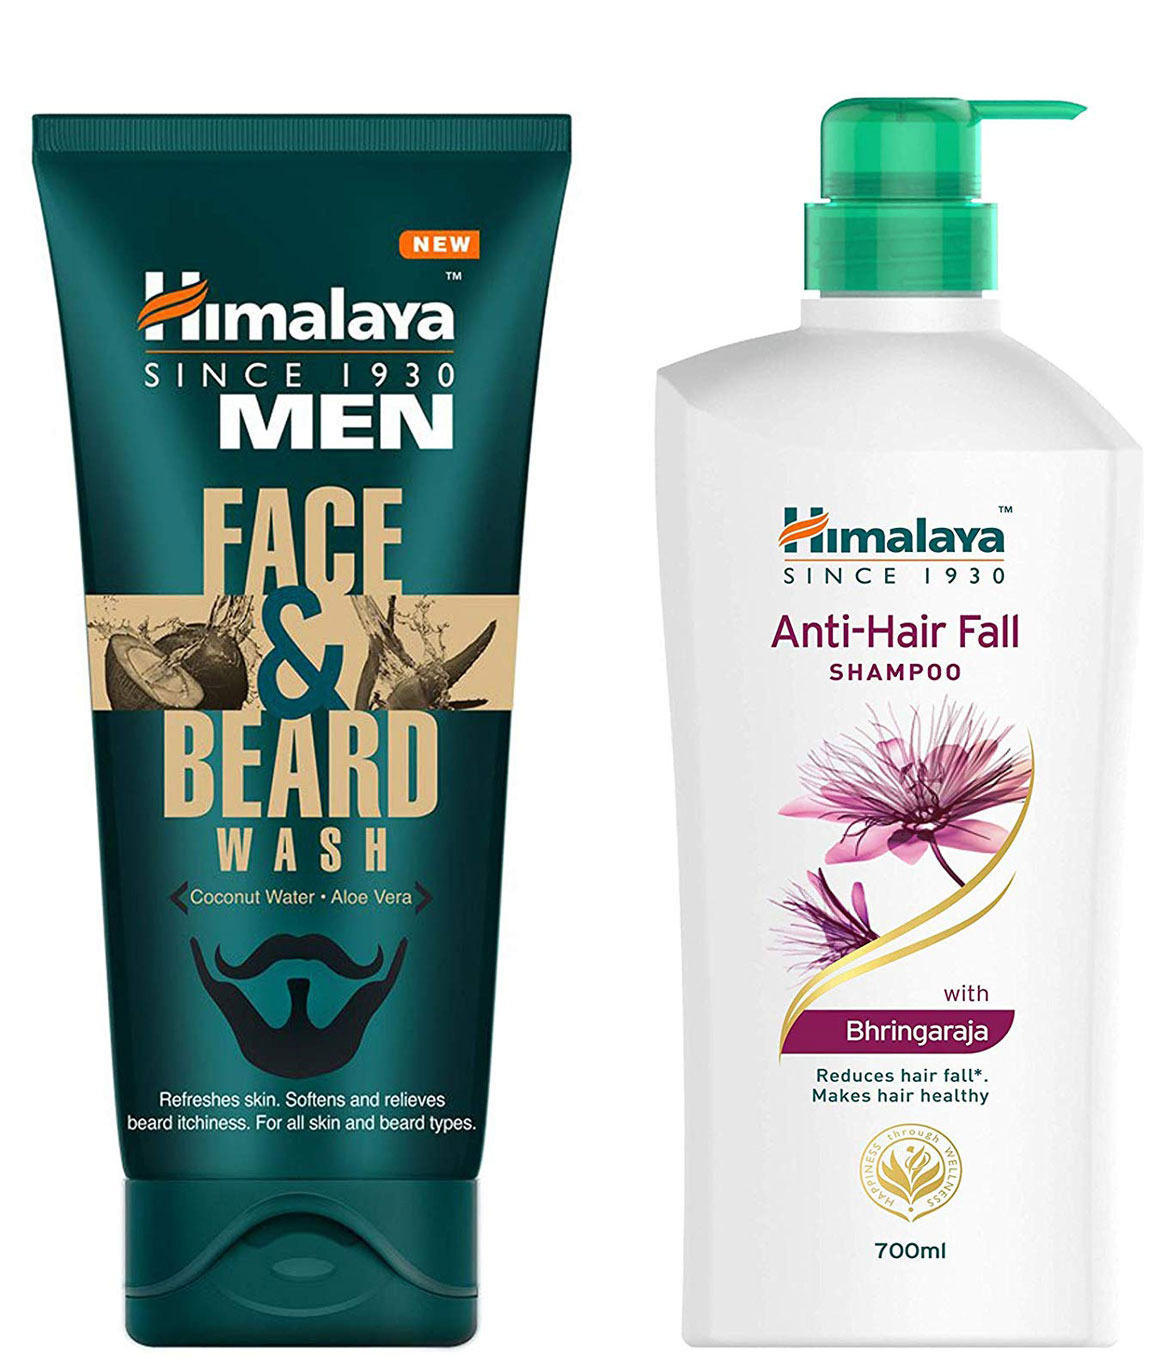 Himalaya Men Face And Beard Wash 80ml and Himalaya Anti Hair Fall Shampoo 700ml